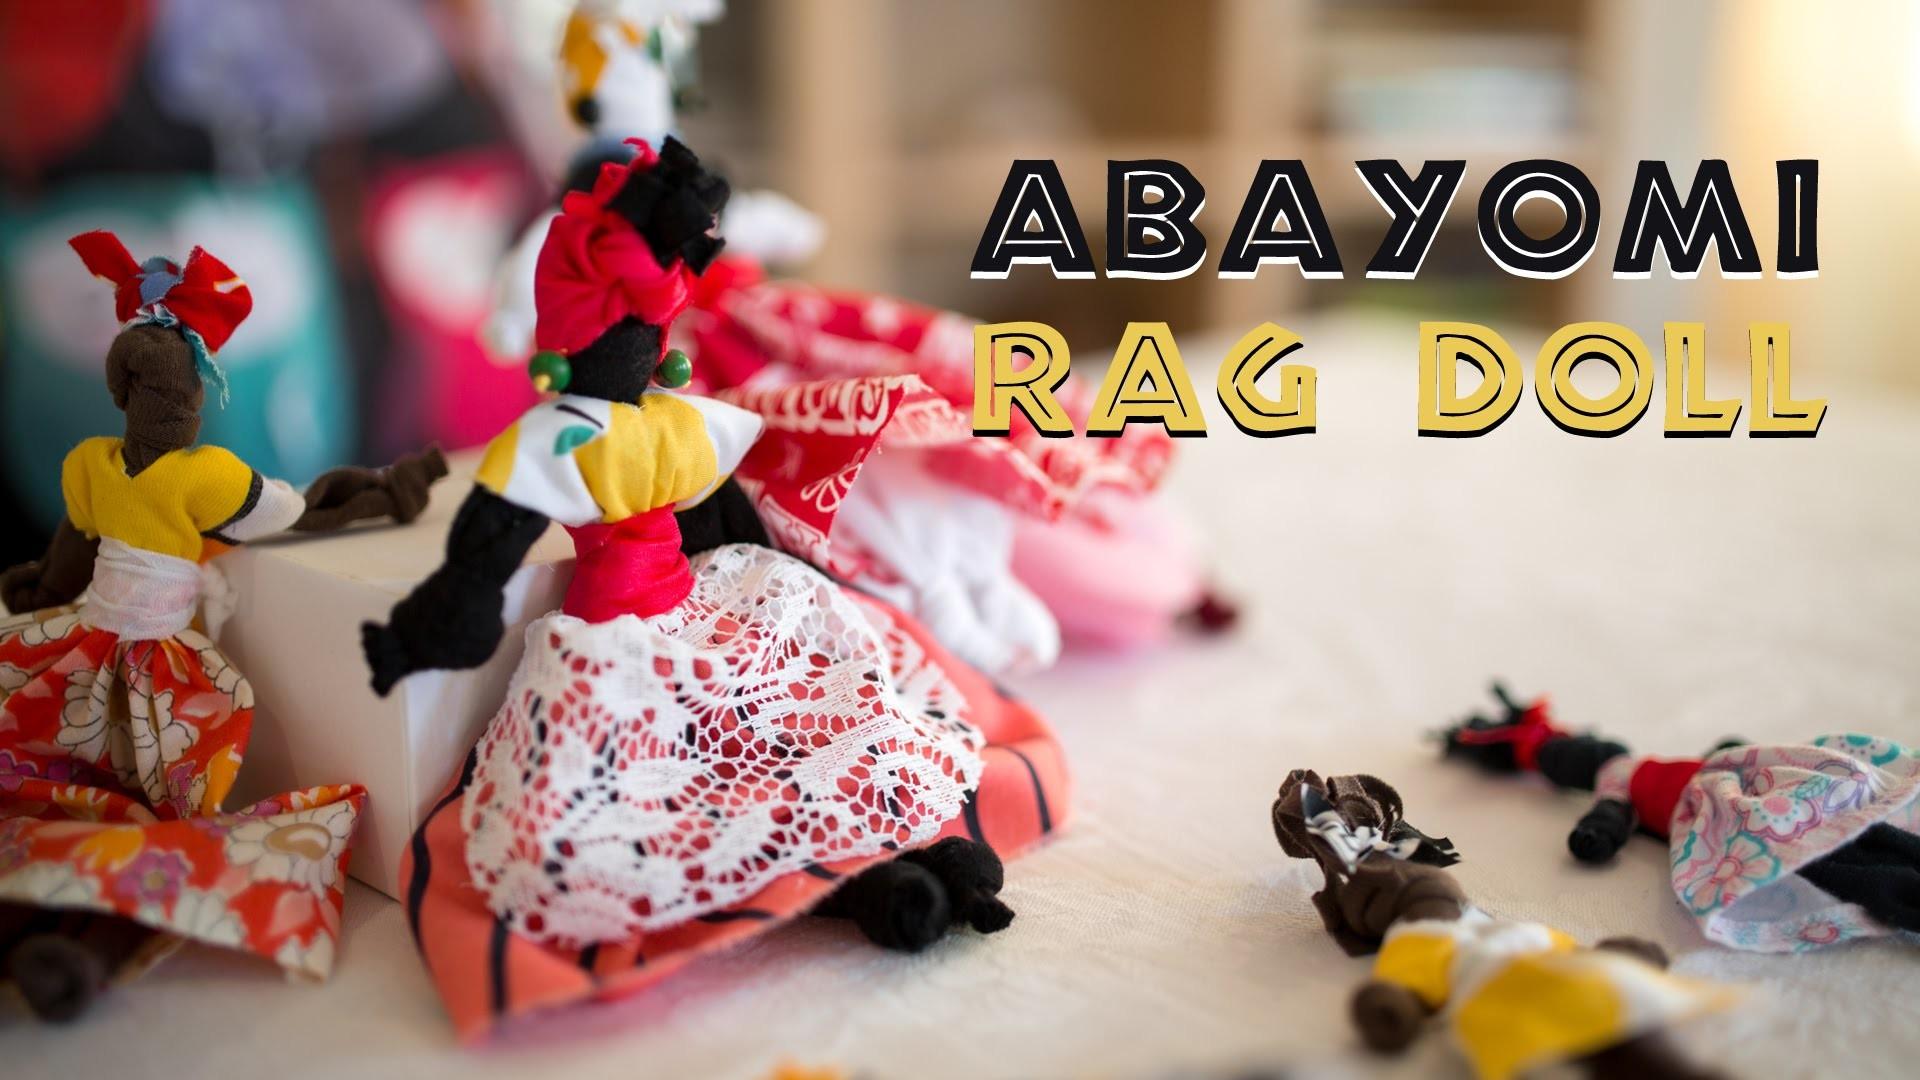 Abayomi Doll Activity - (African Craft Gift Idea)